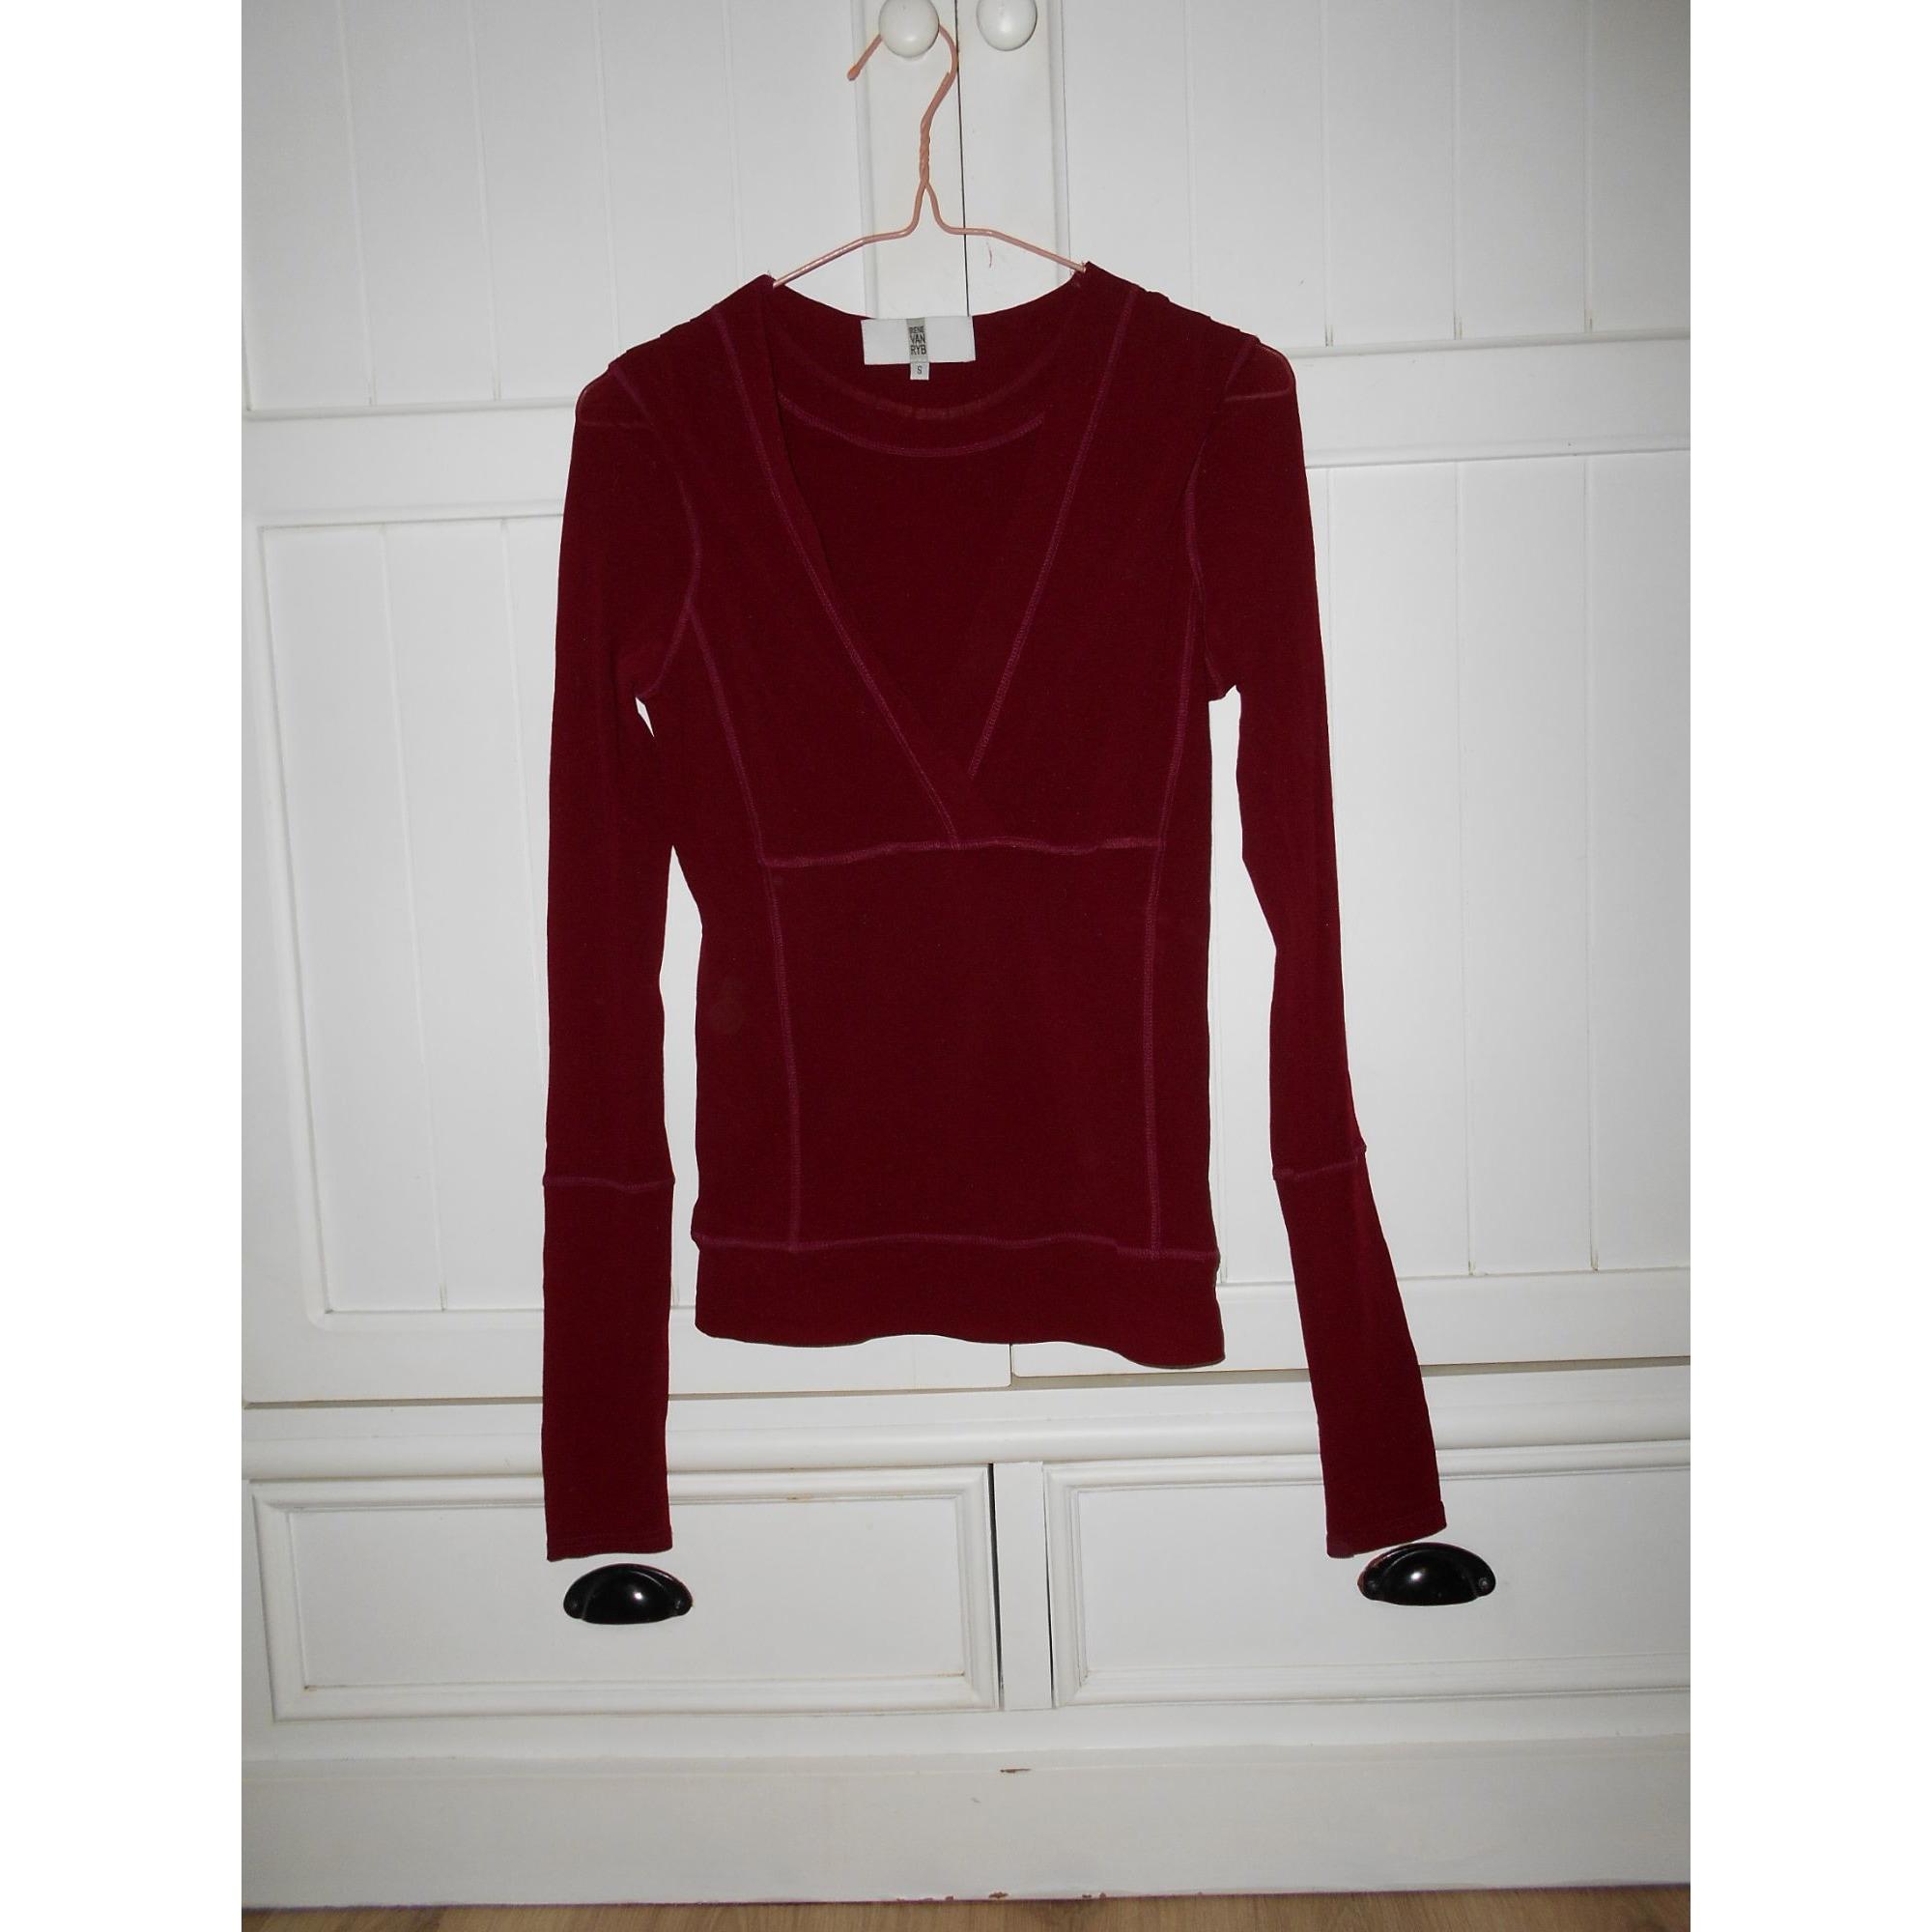 Top, tee-shirt IRENE VAN RYB Rouge, bordeaux